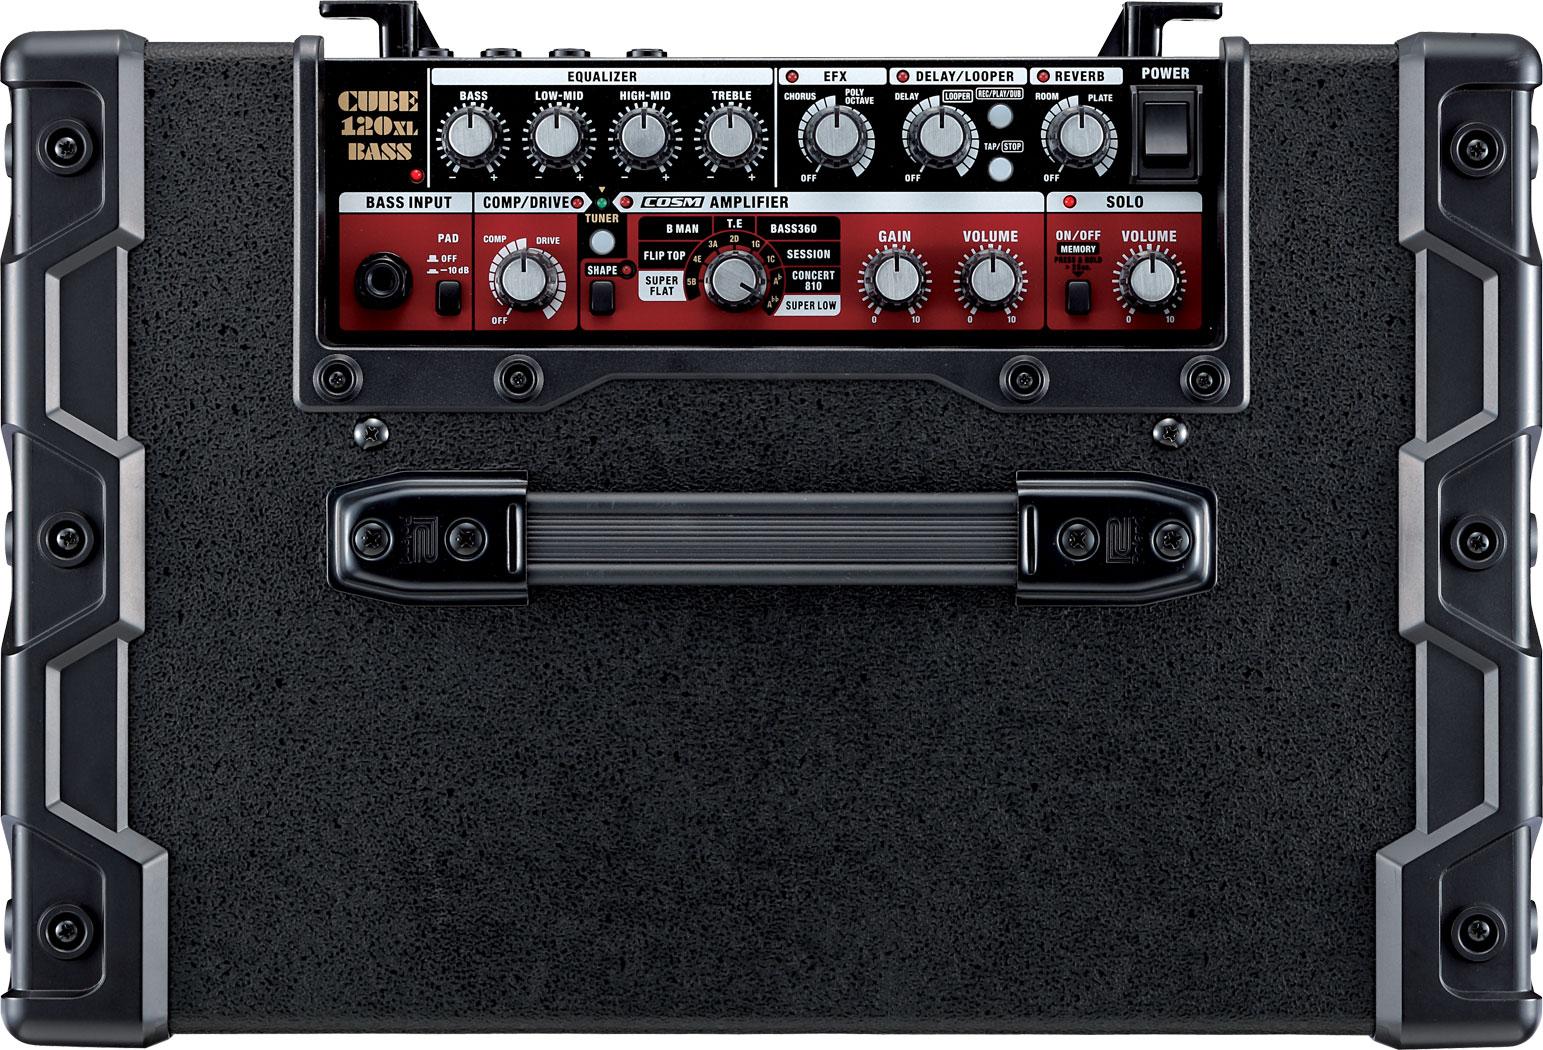 Loa Roland Cube bass 120XL